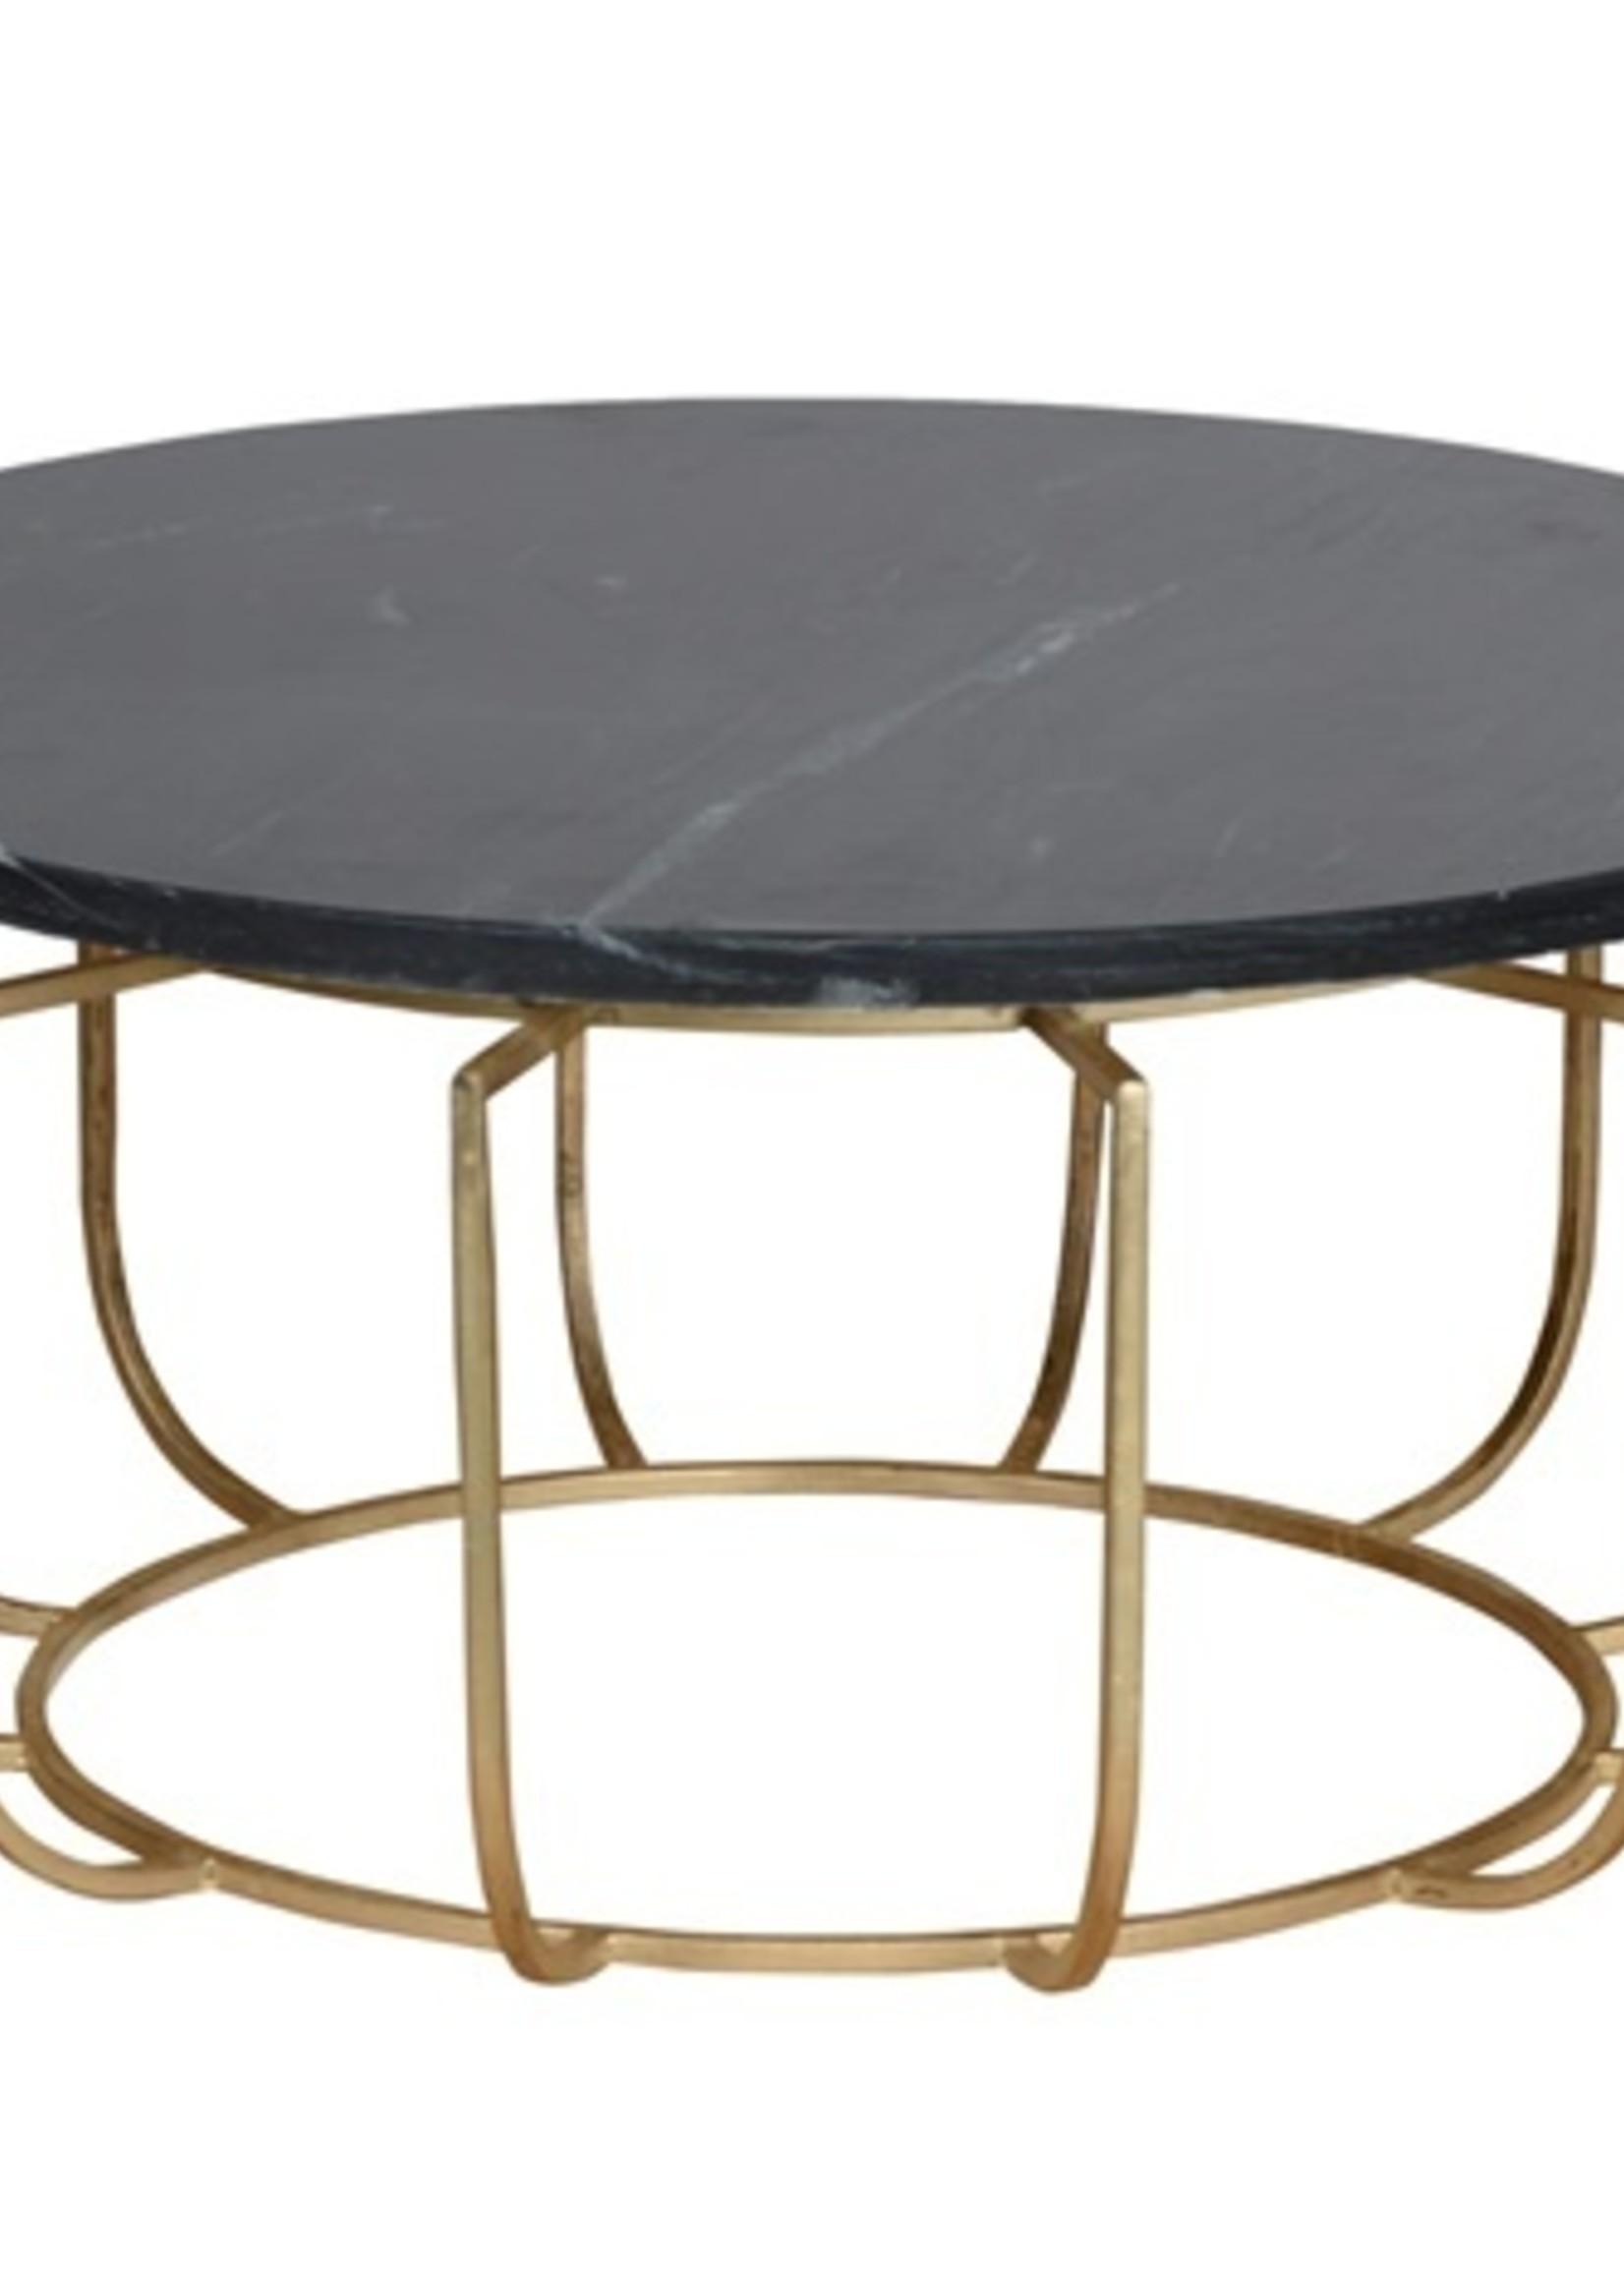 Moods Collection Salontafel - goud/zwart marmer